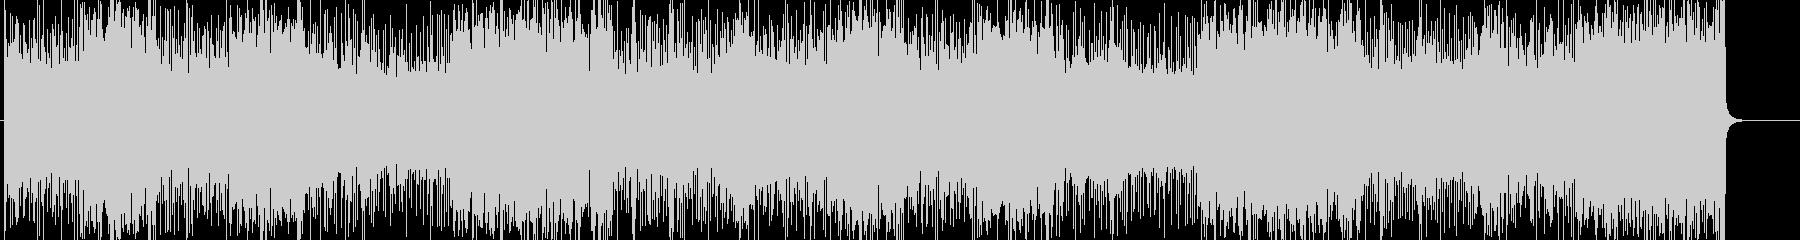 「HR/HM」「DEATH」BGM177の未再生の波形